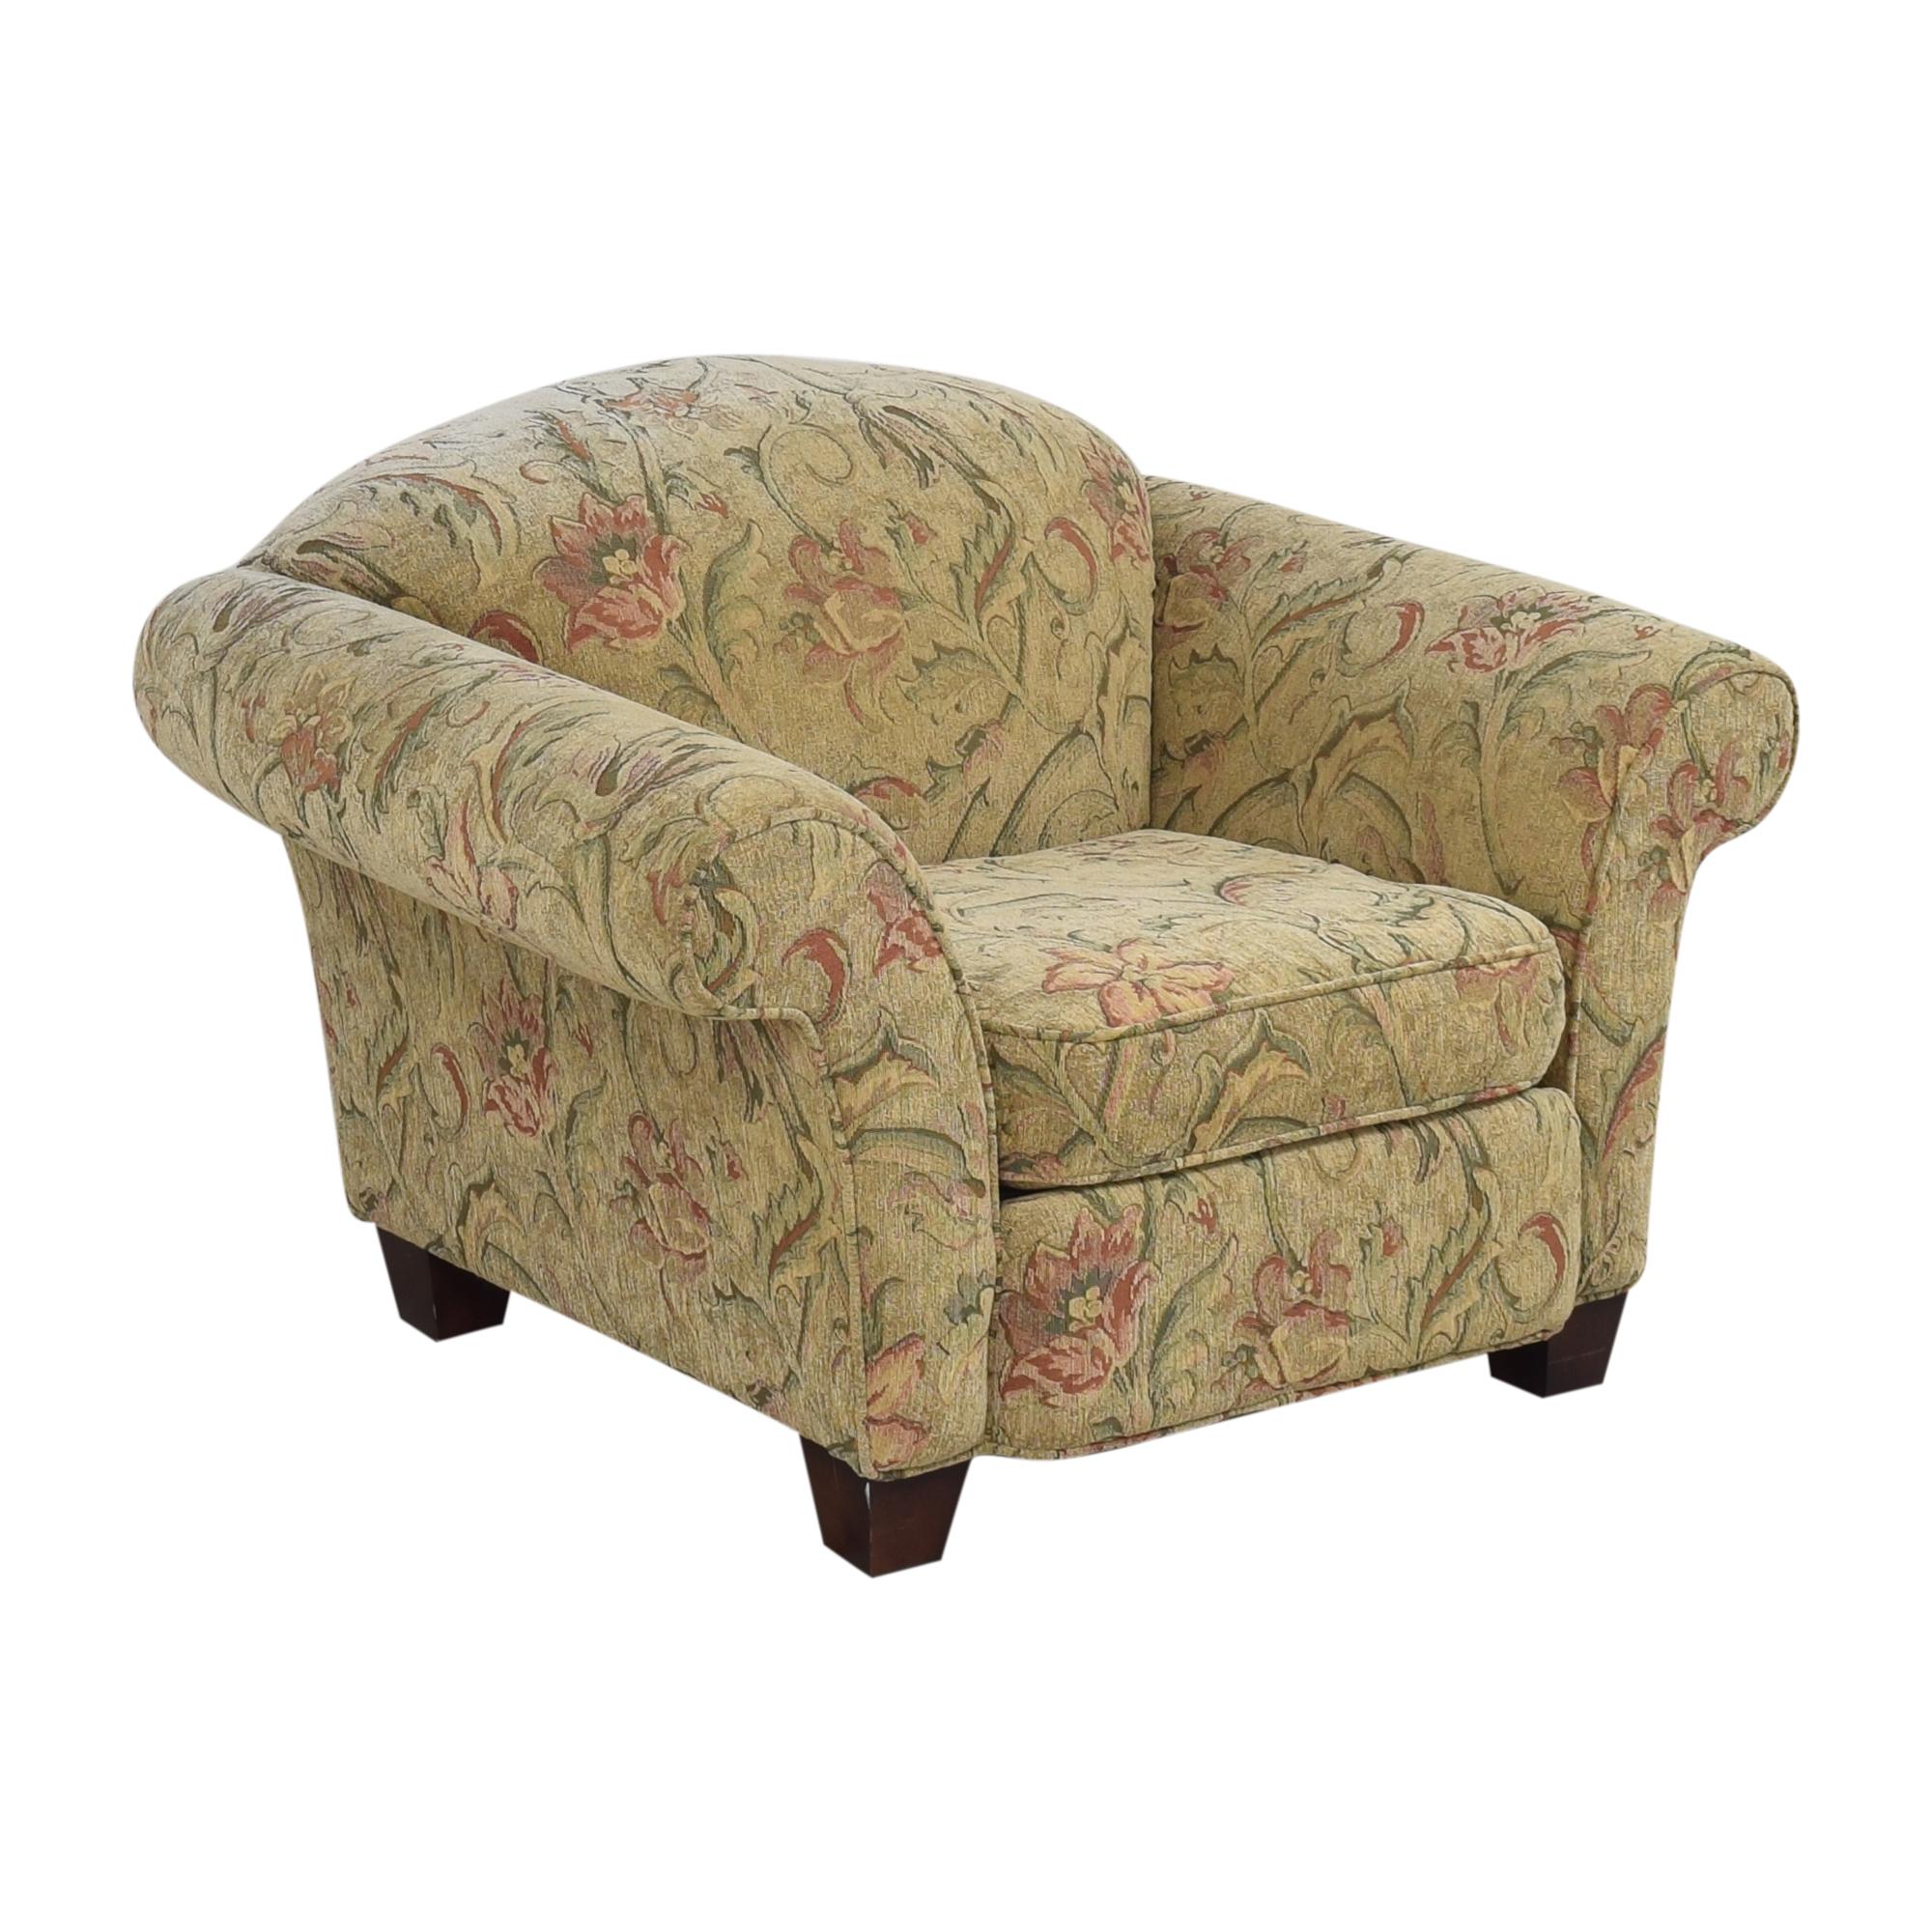 Braxton Culler Braxton Culler Floral Roll Arm Chair second hand